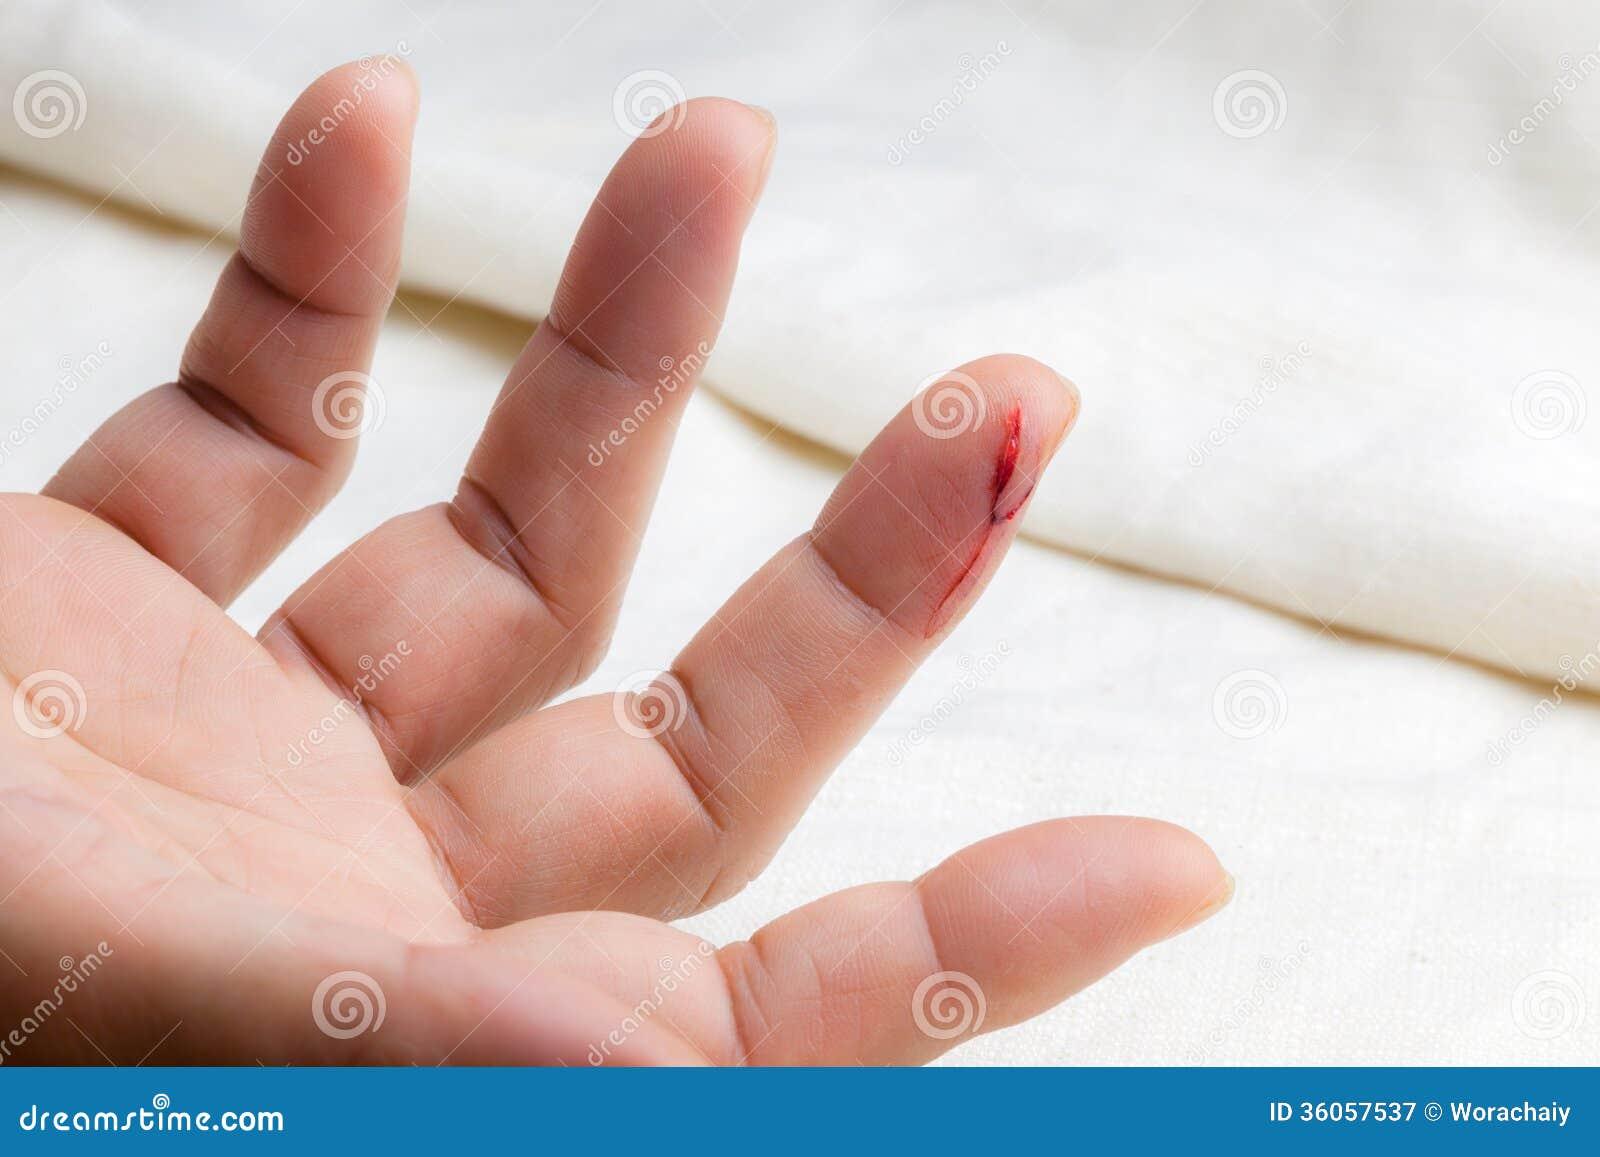 Injured Finger Stock Image. Image Of Horror, Skin, Injury